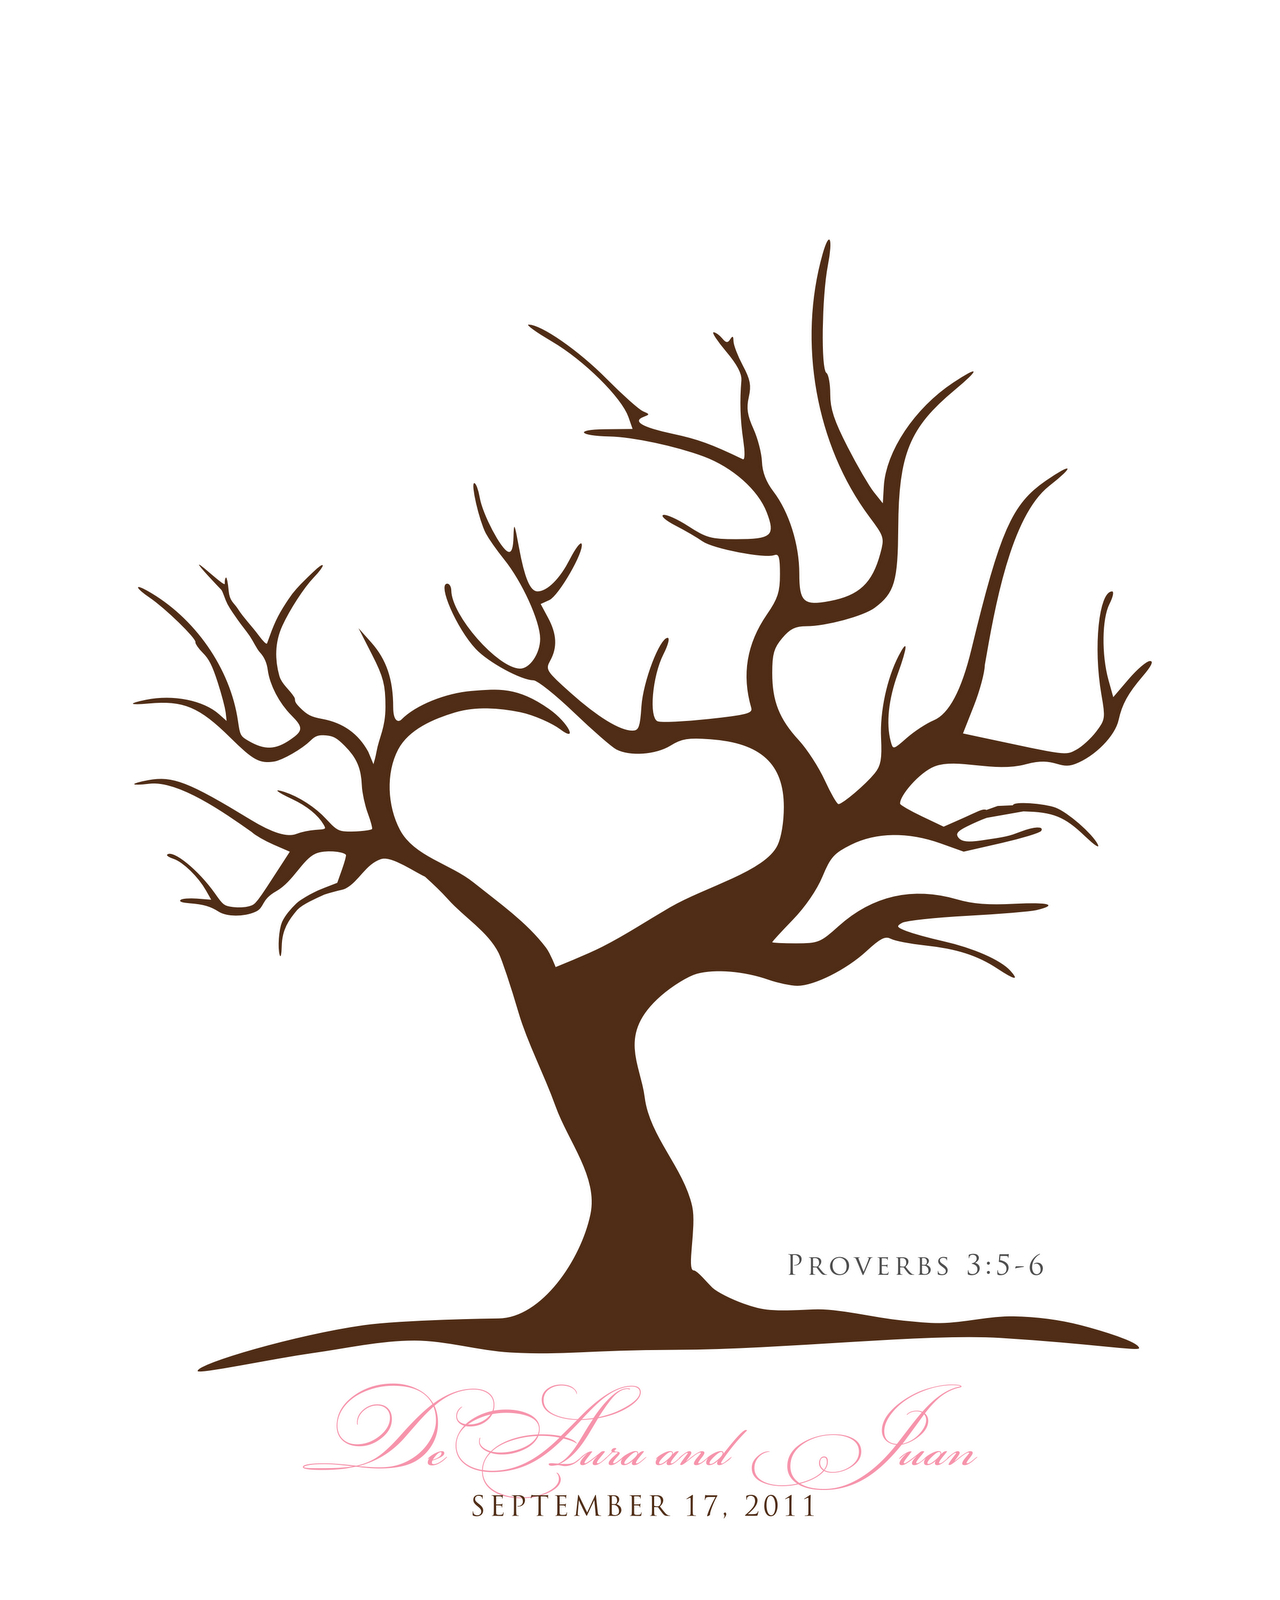 Free Printable Fingerprint Tree Template | Embroidery | Fingerprint - Free Printable Tree Template